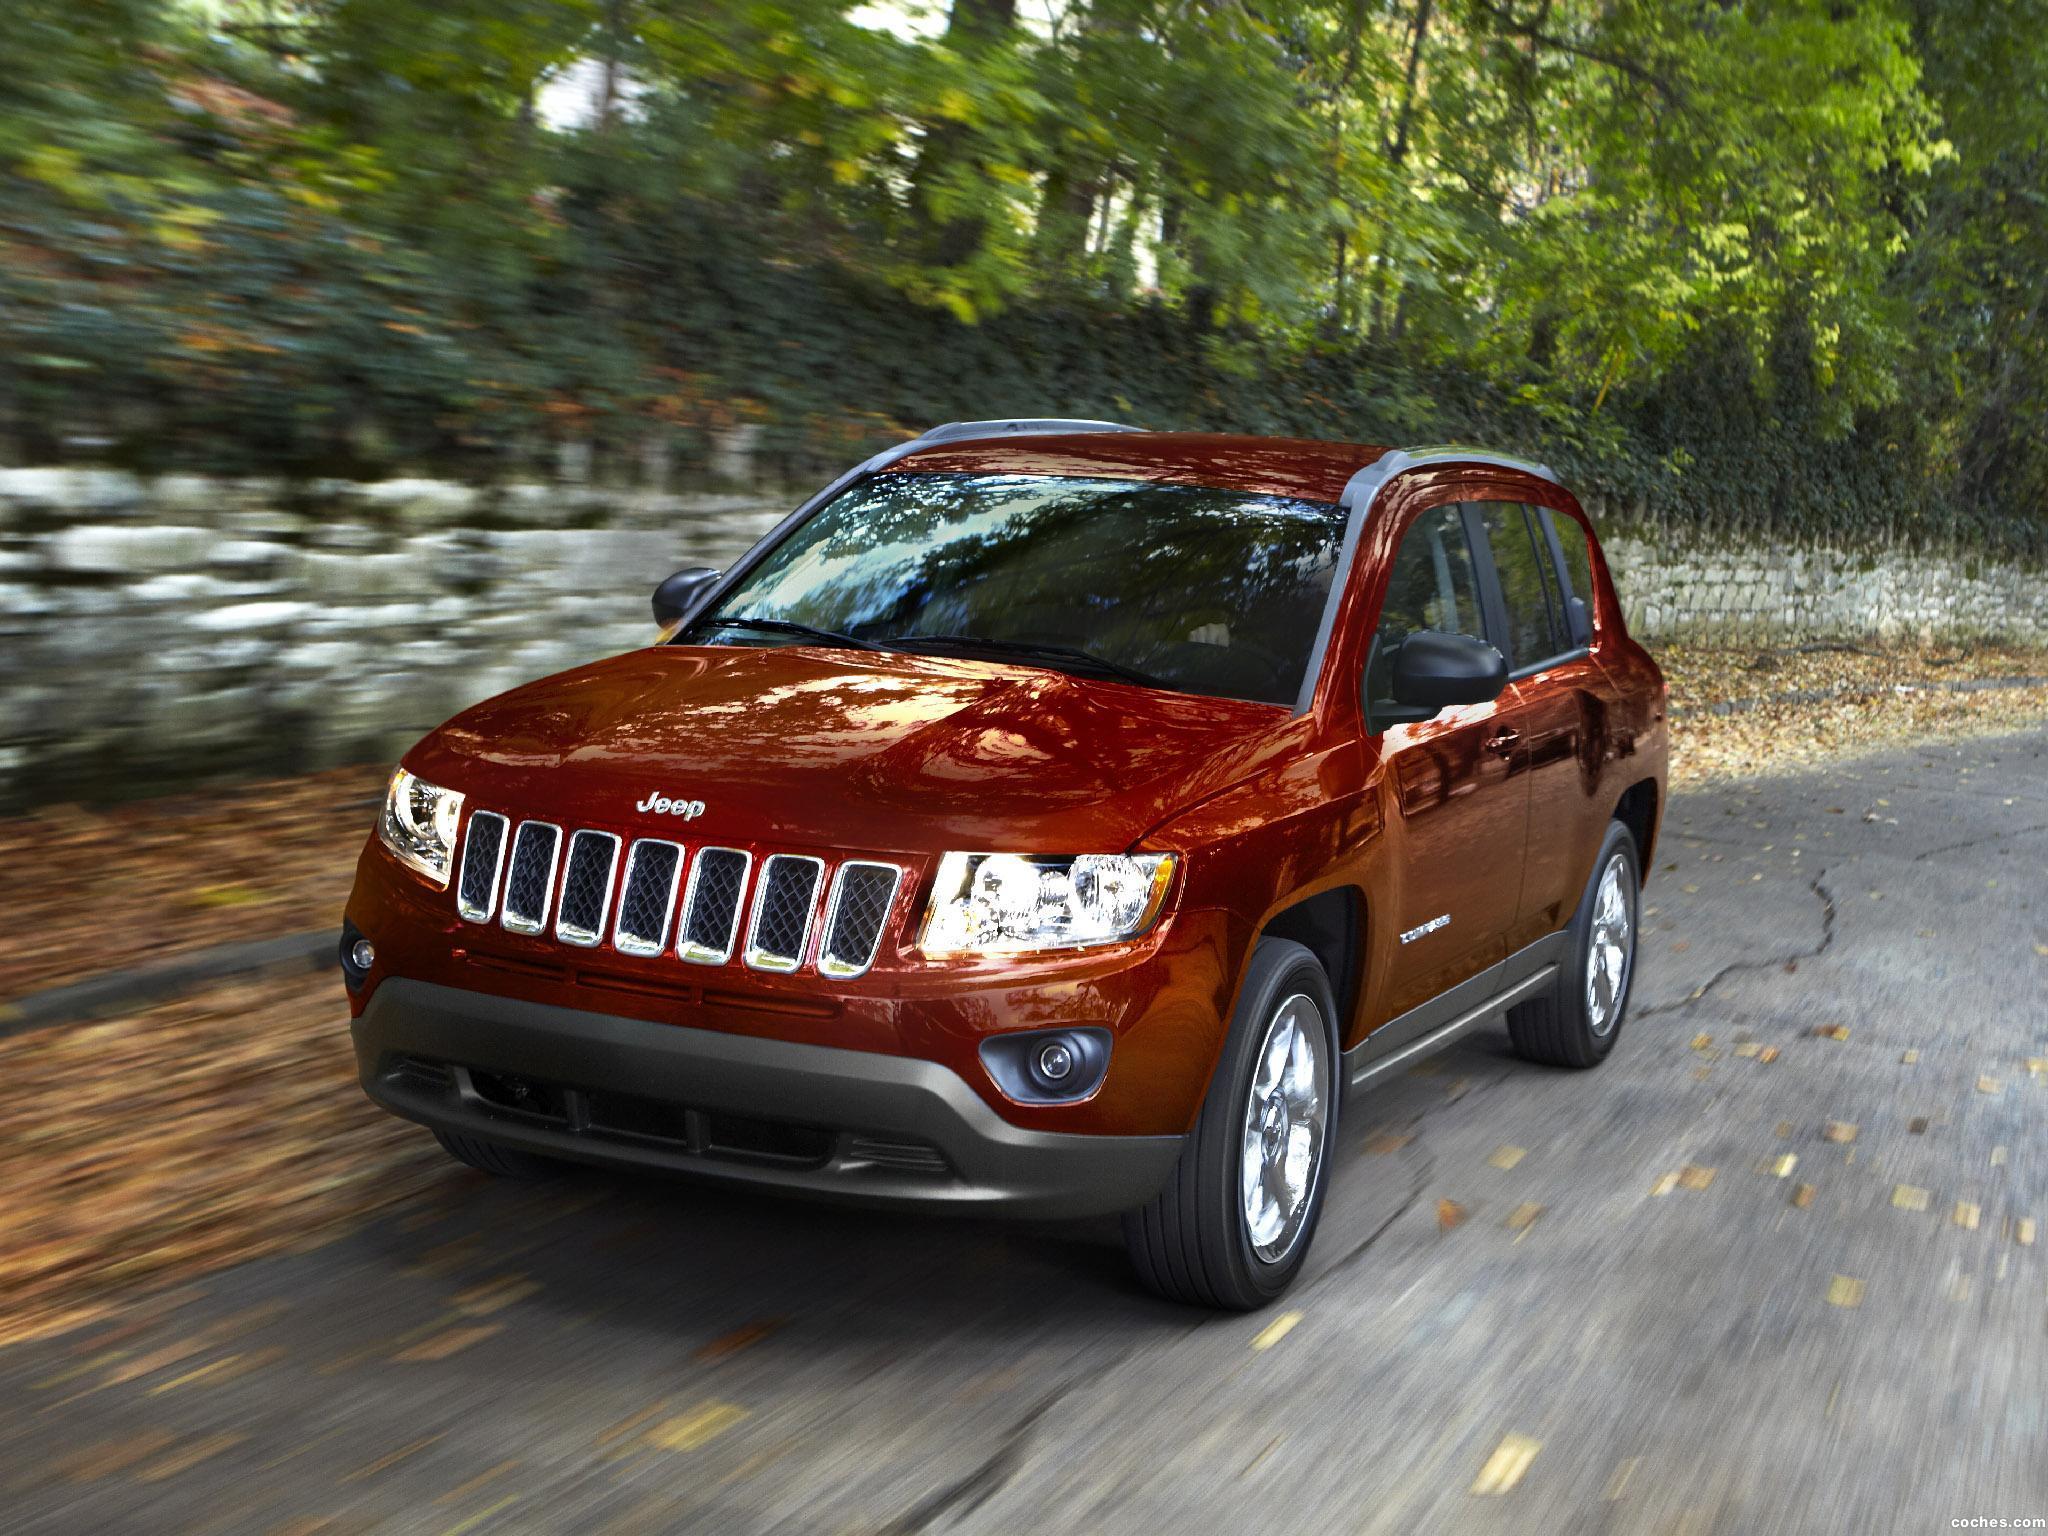 Foto 2 de Jeep Compass 2011